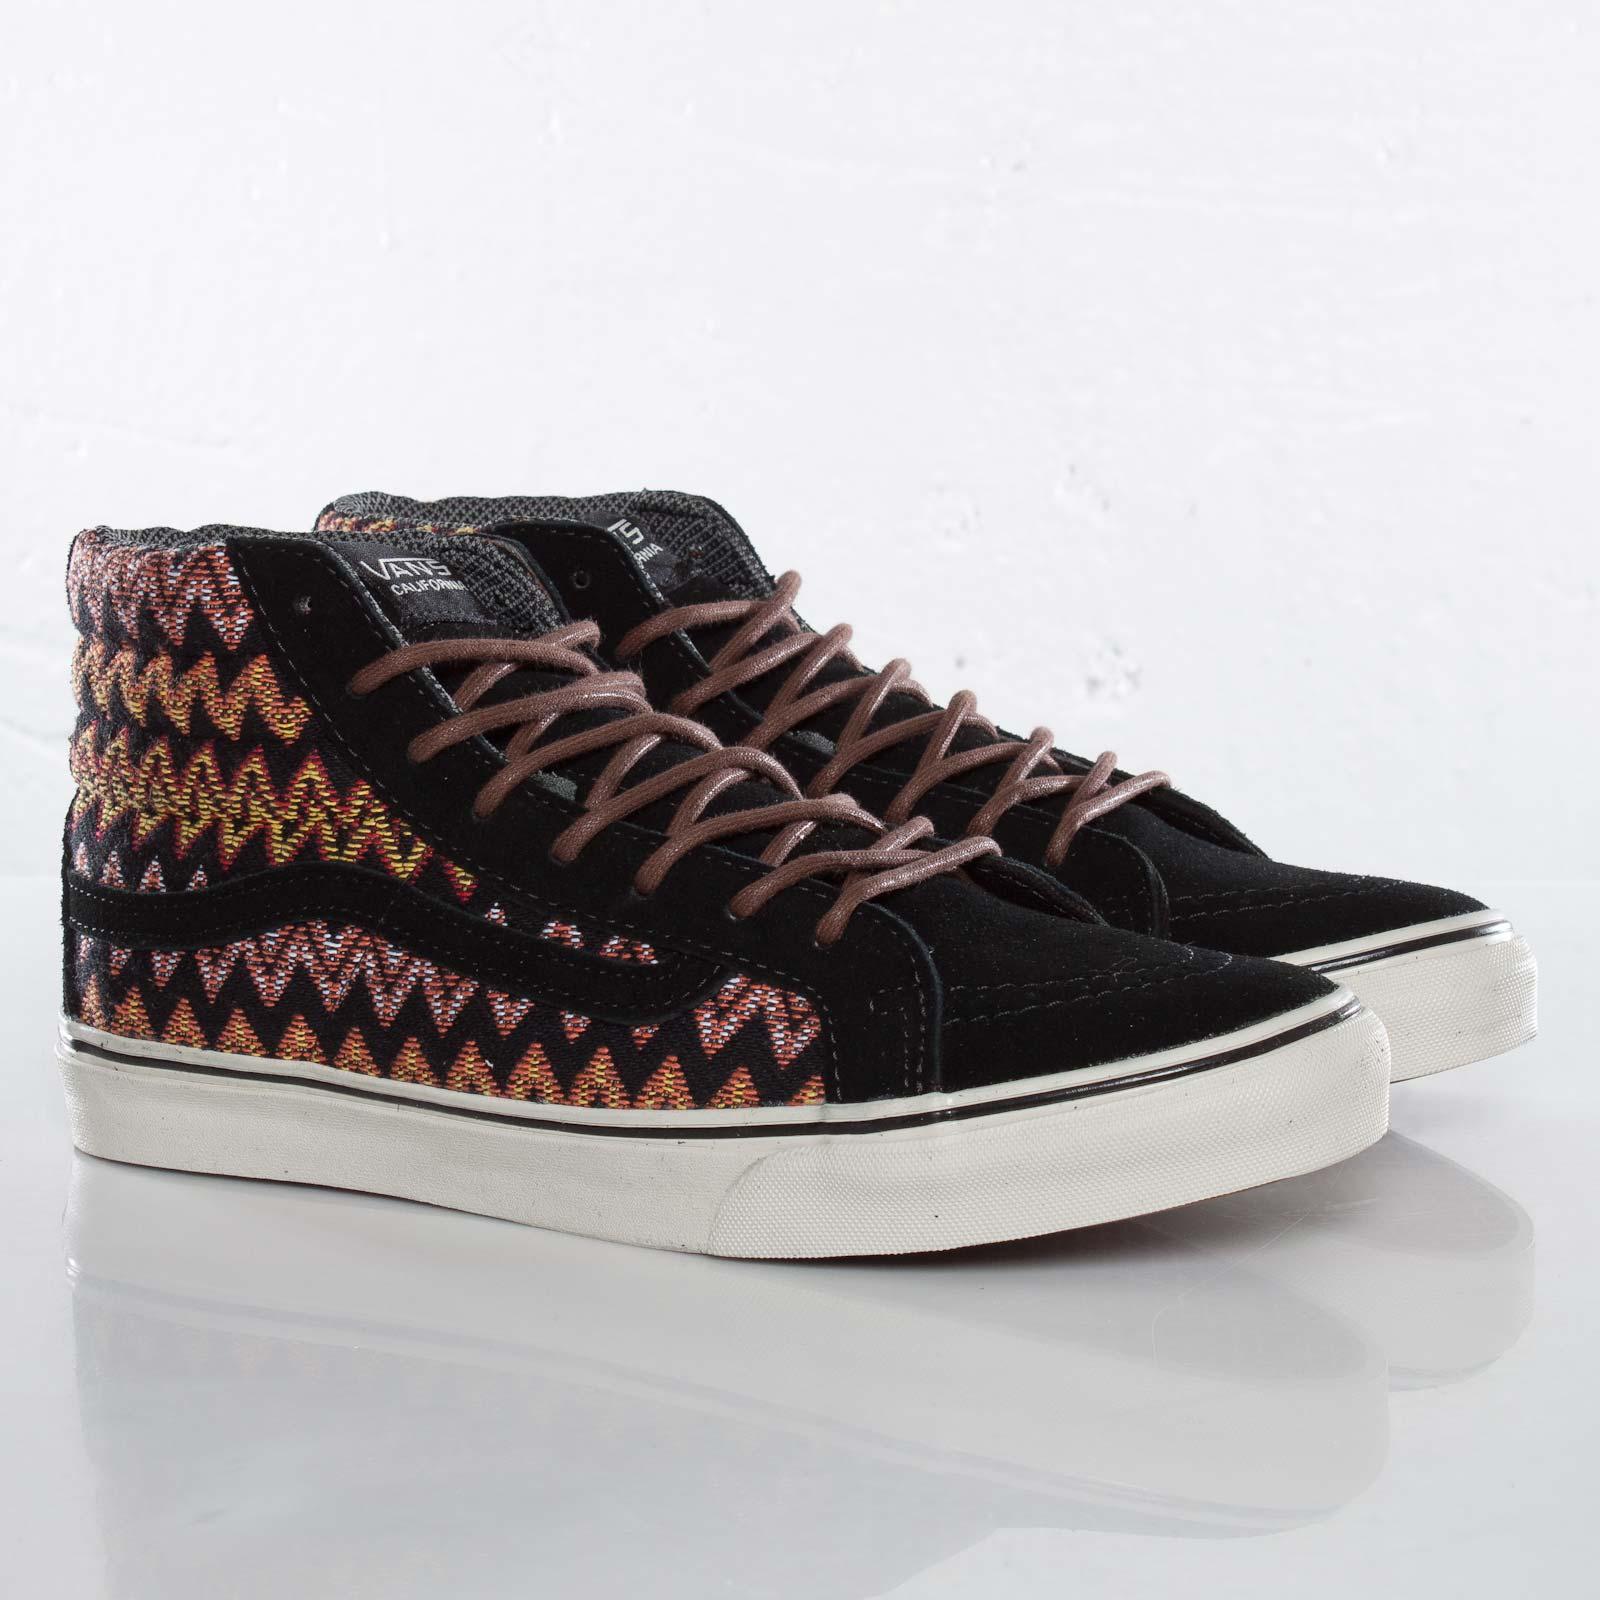 1a9a98b9b1 Vans Sk8-Hi Slim Ca (Zig Zag) - Rra74n - Sneakersnstuff